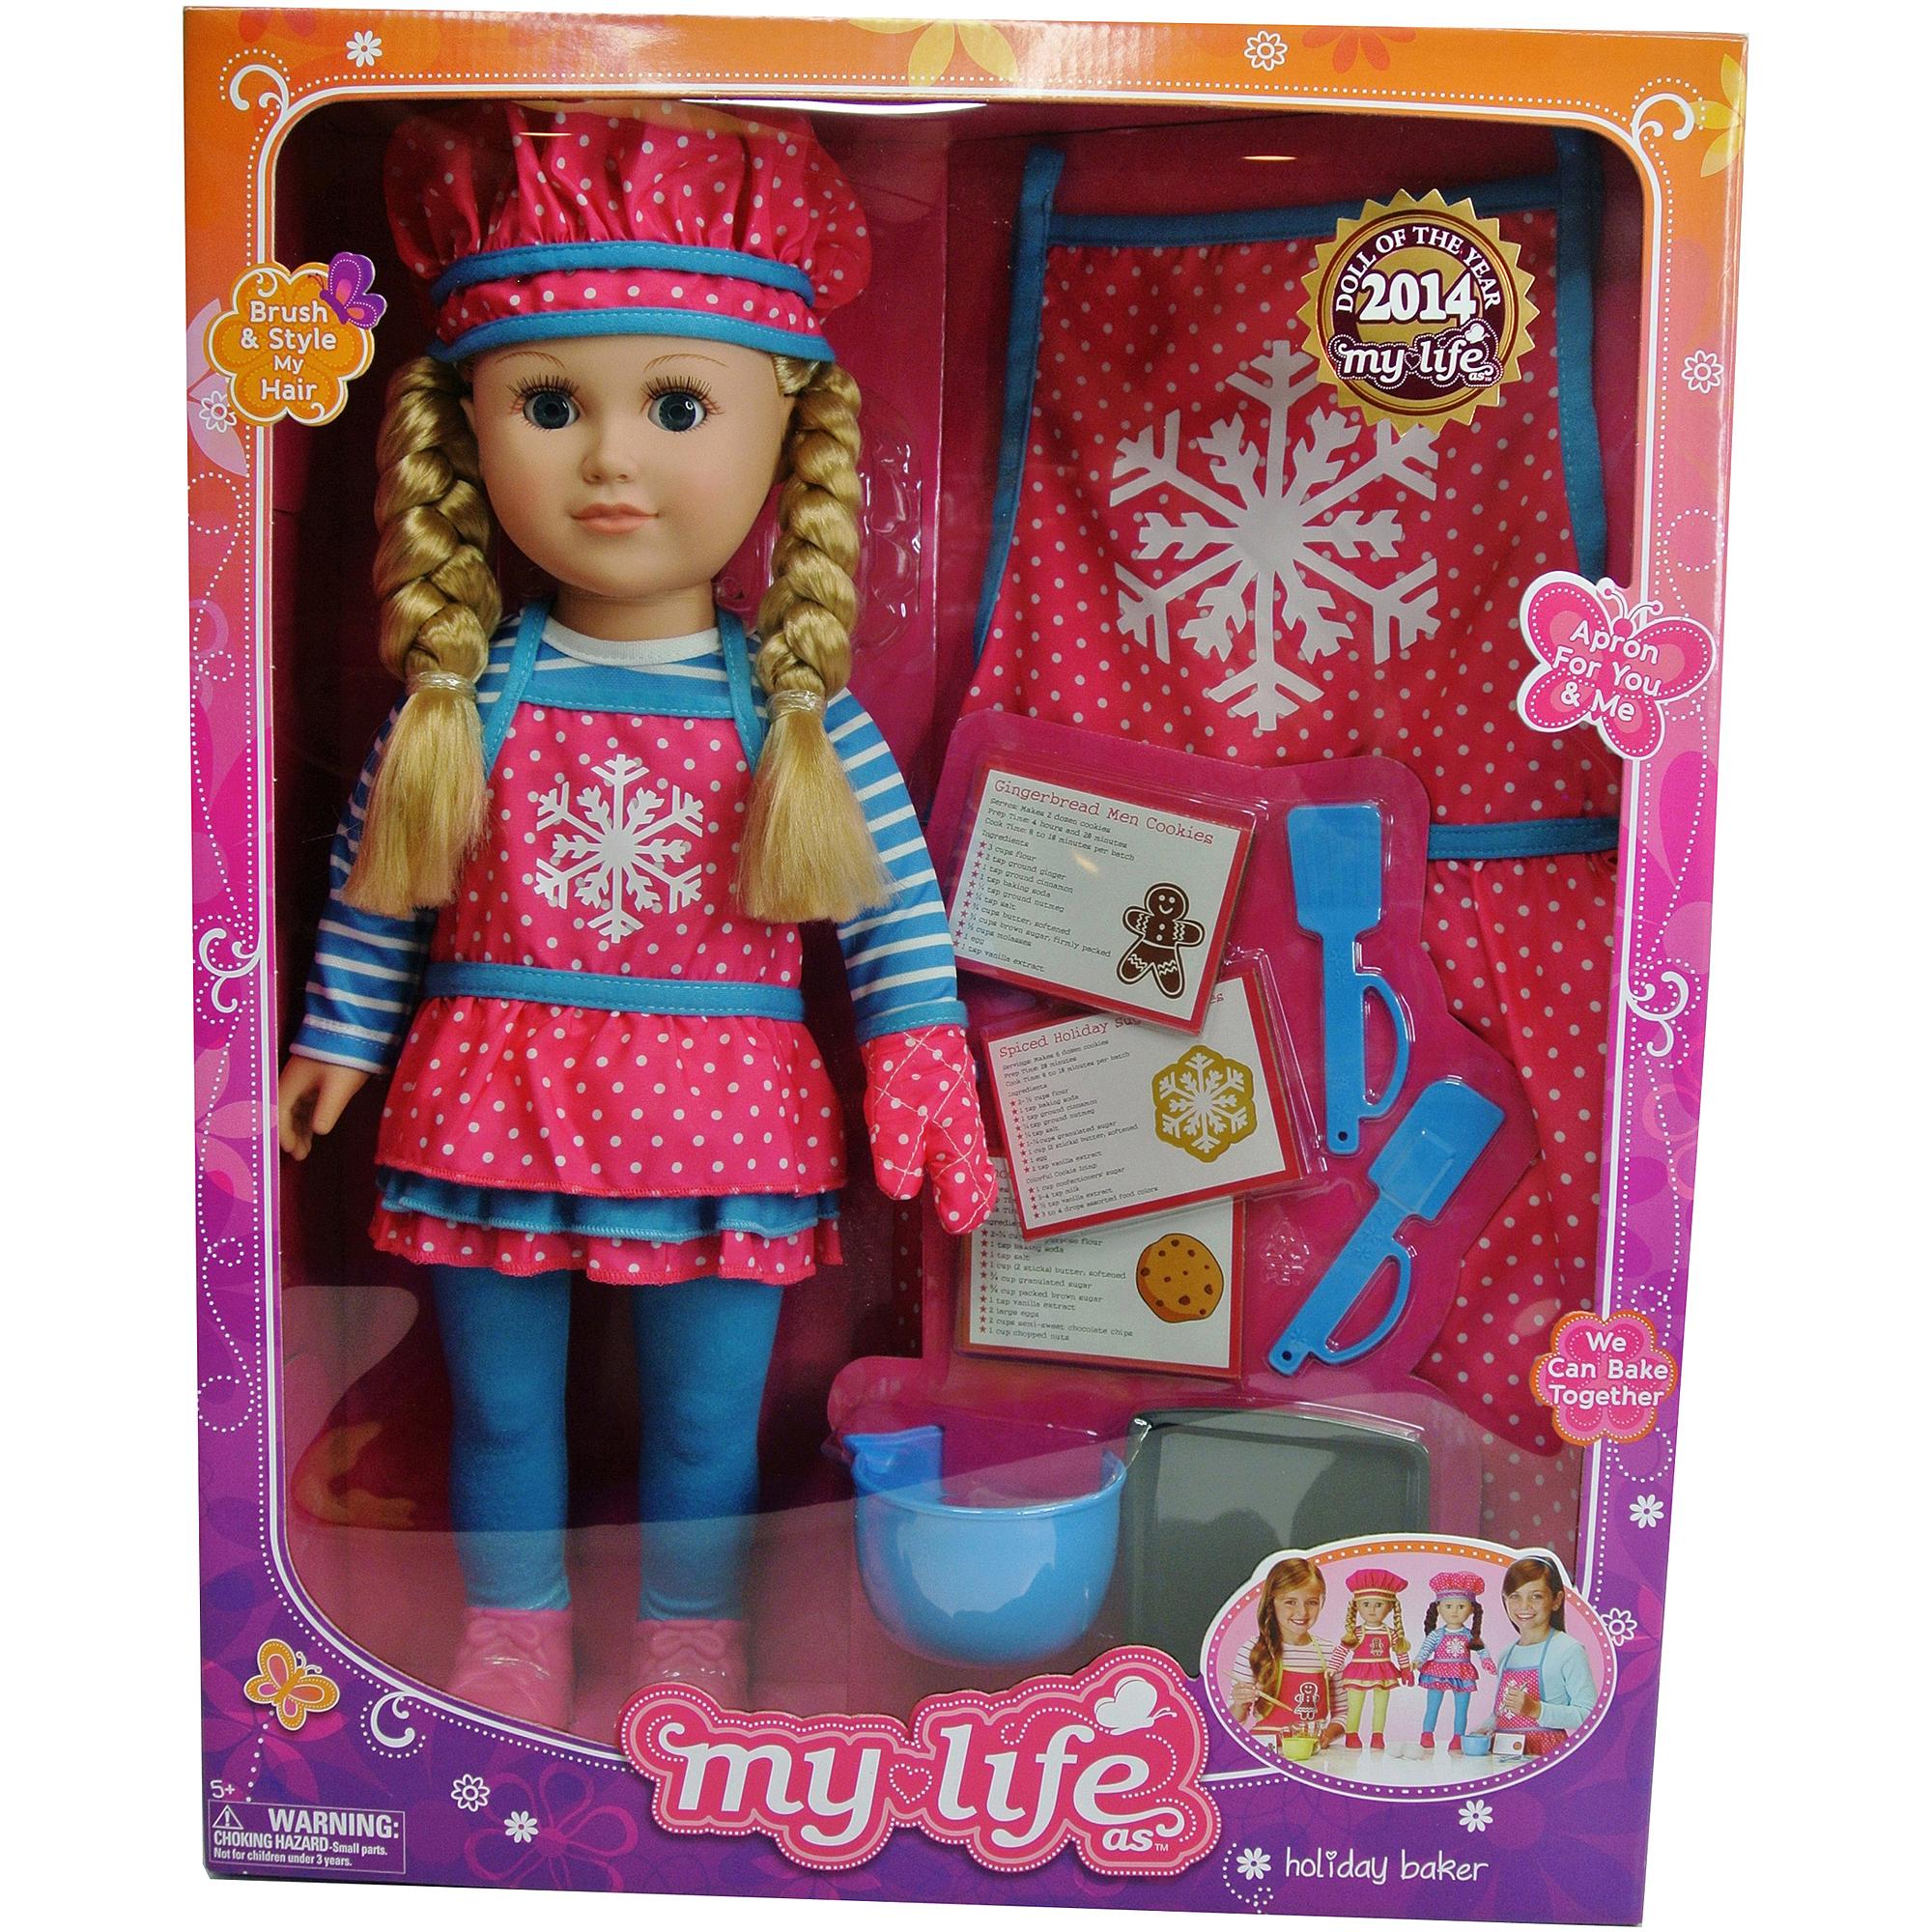 "My Life As Doll of 2014 Holiday Baker 18"" Doll, Snowflake, Caucasain with Medium Blonde Hair"